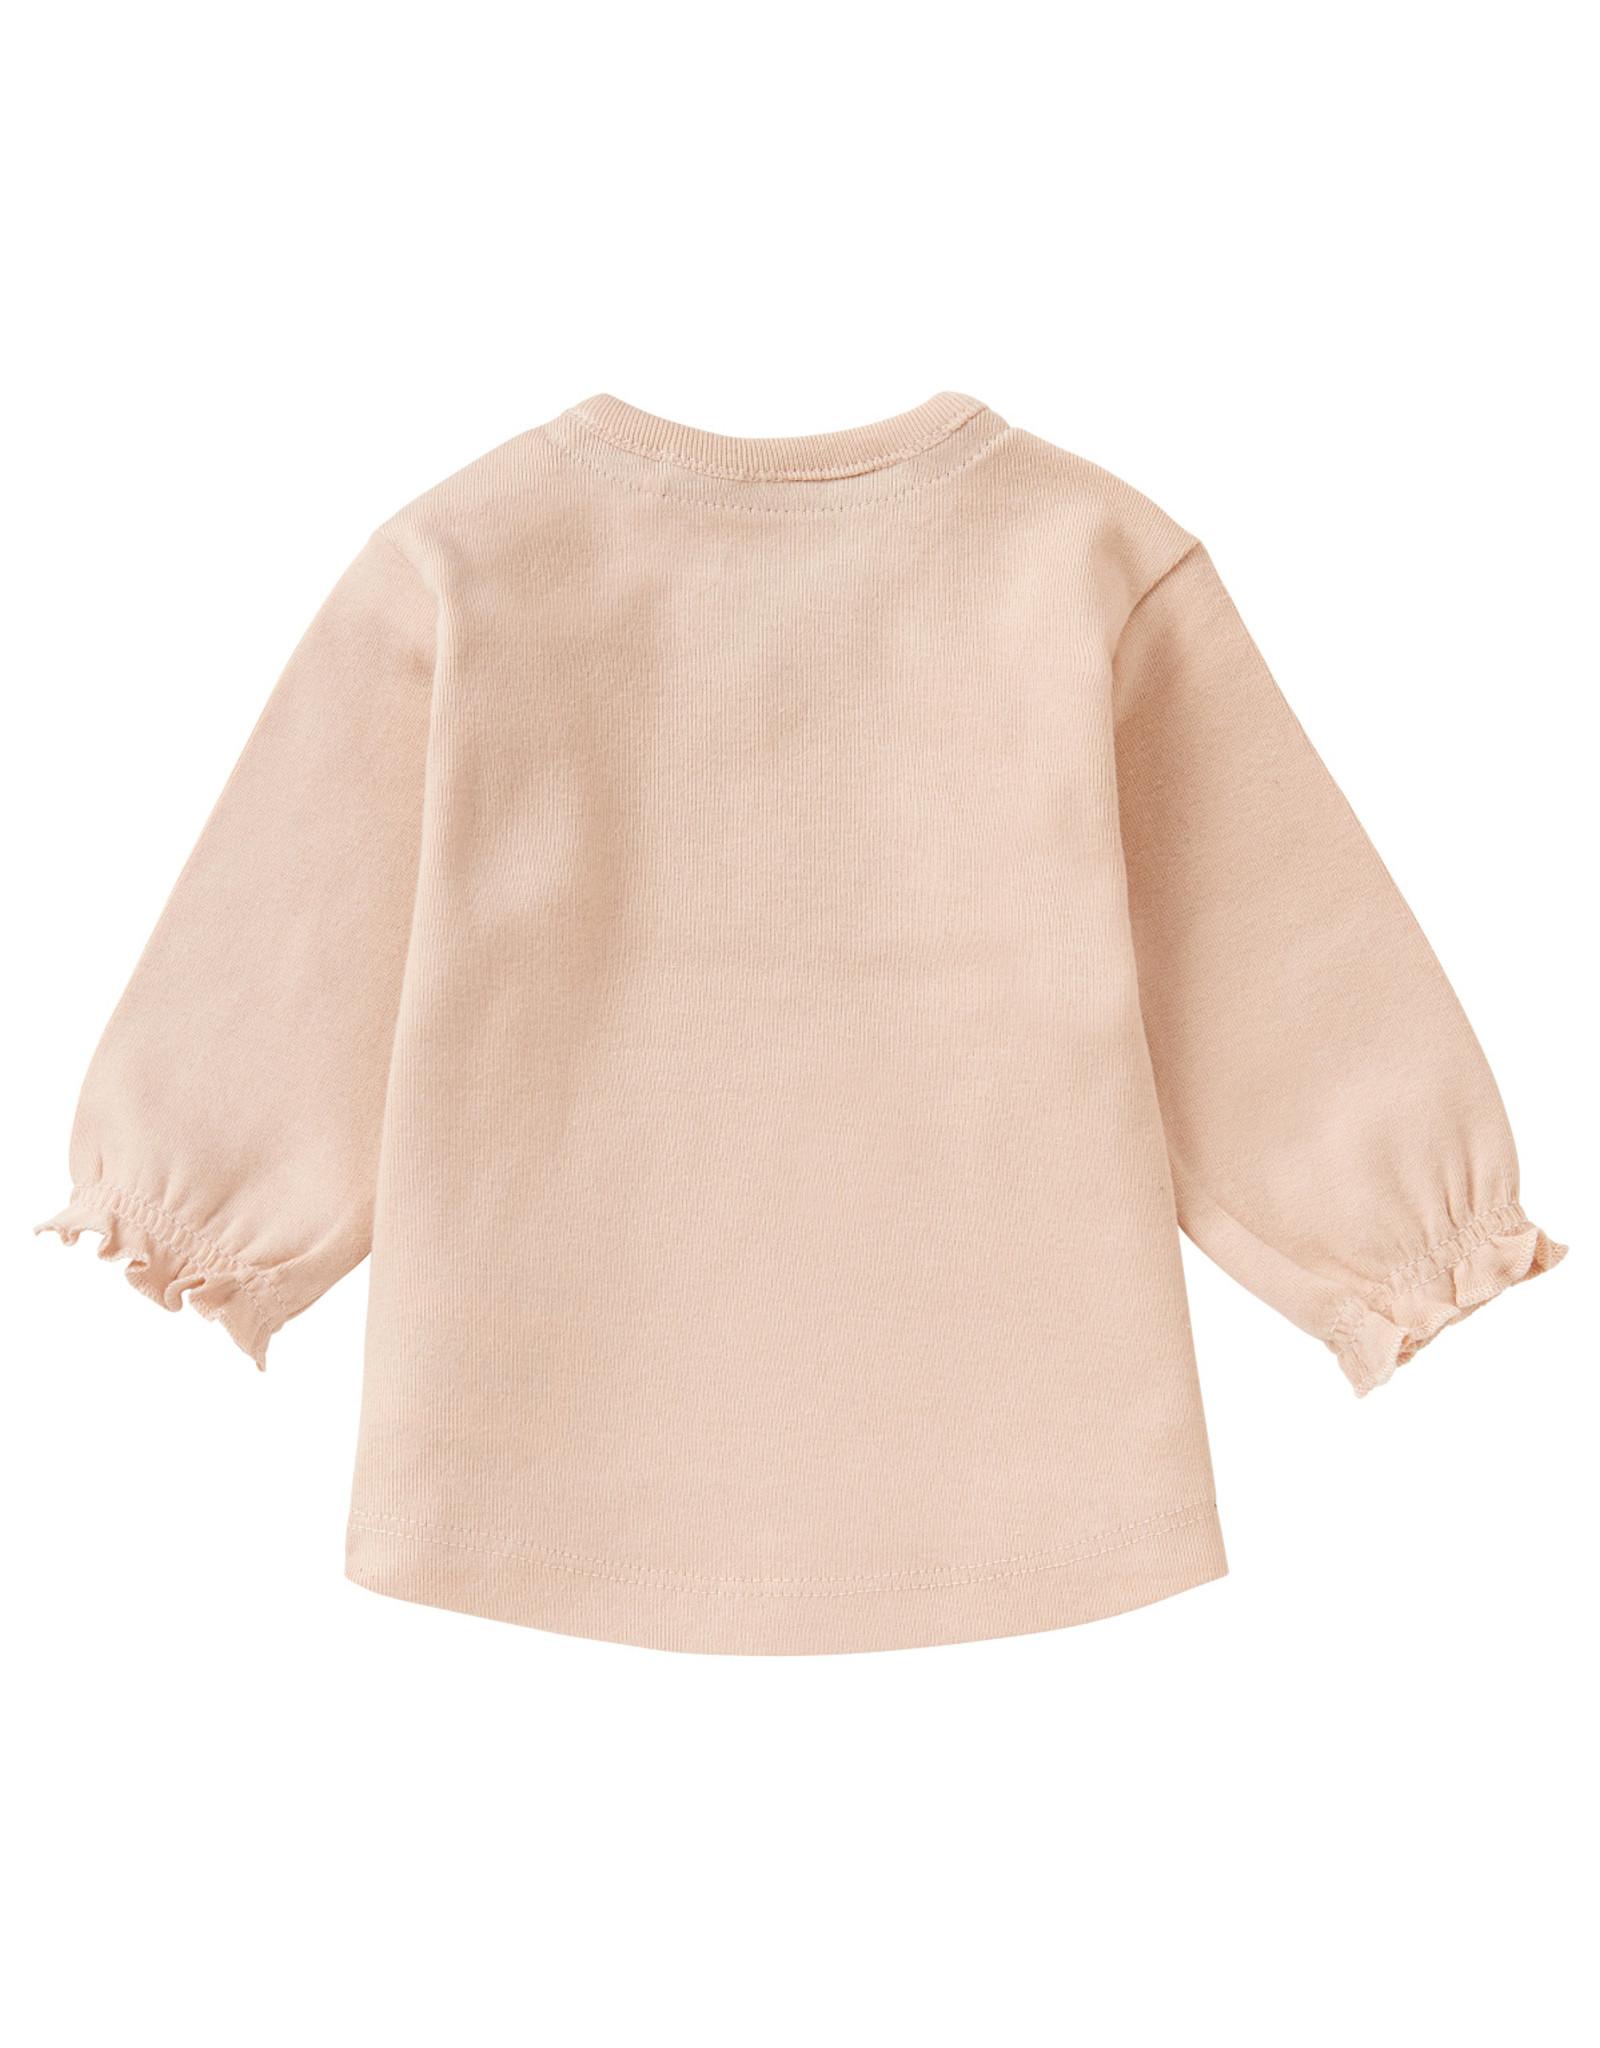 Noppies Noppies G Regular T-shirt LS Ladysmith Cameo Rose